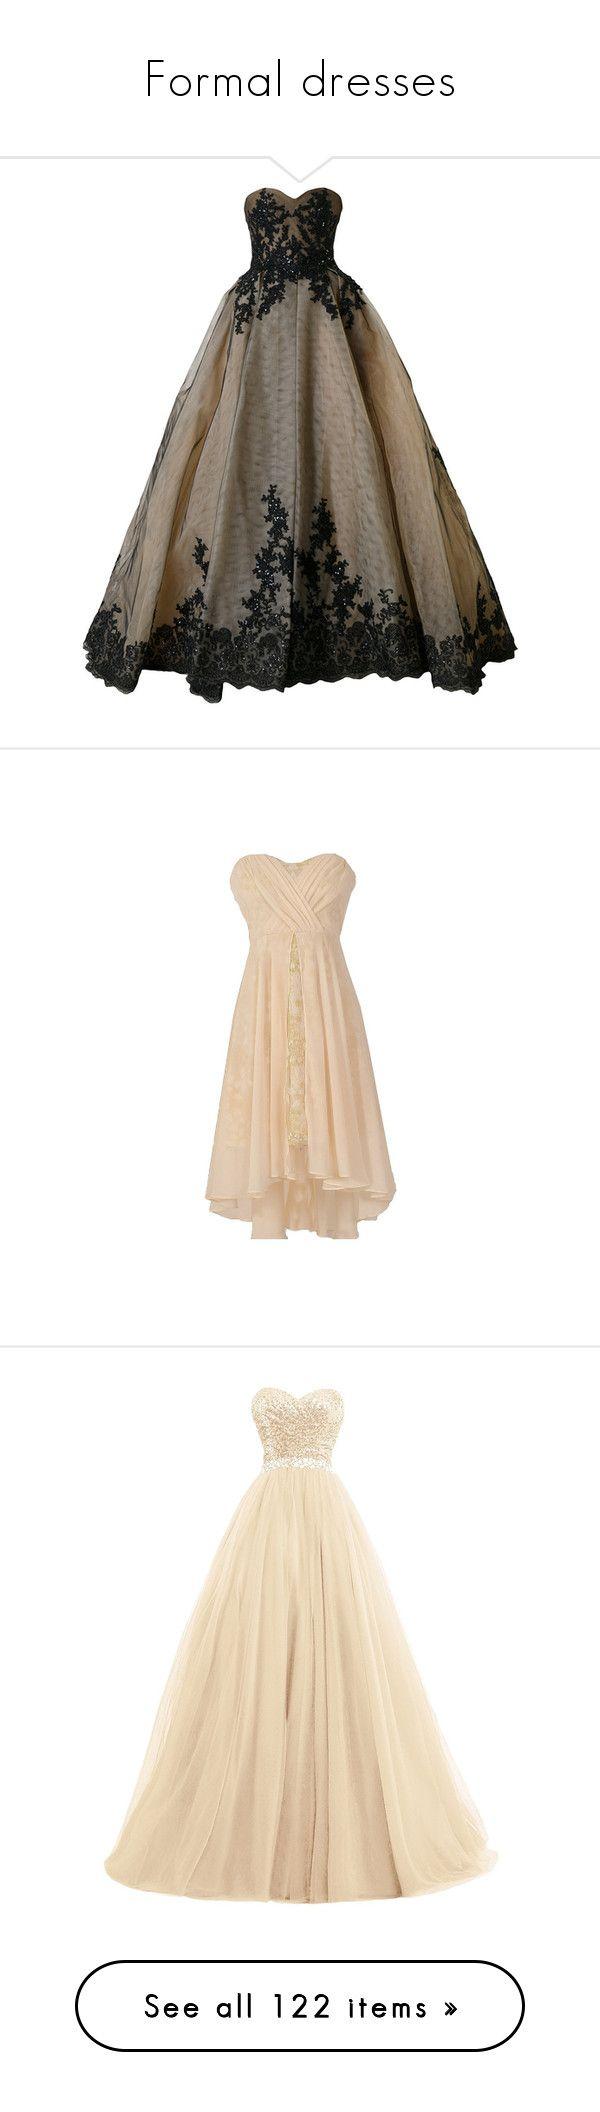 """Formal dresses"" by keeprunning1245 ❤ liked on Polyvore featuring black, dresses, sweetheart neckline prom dress, sweetheart dress, beige prom dresses, bridal dresses, crisscross dresses, sequin embellished dress, tulle dress and sequin prom dresses"